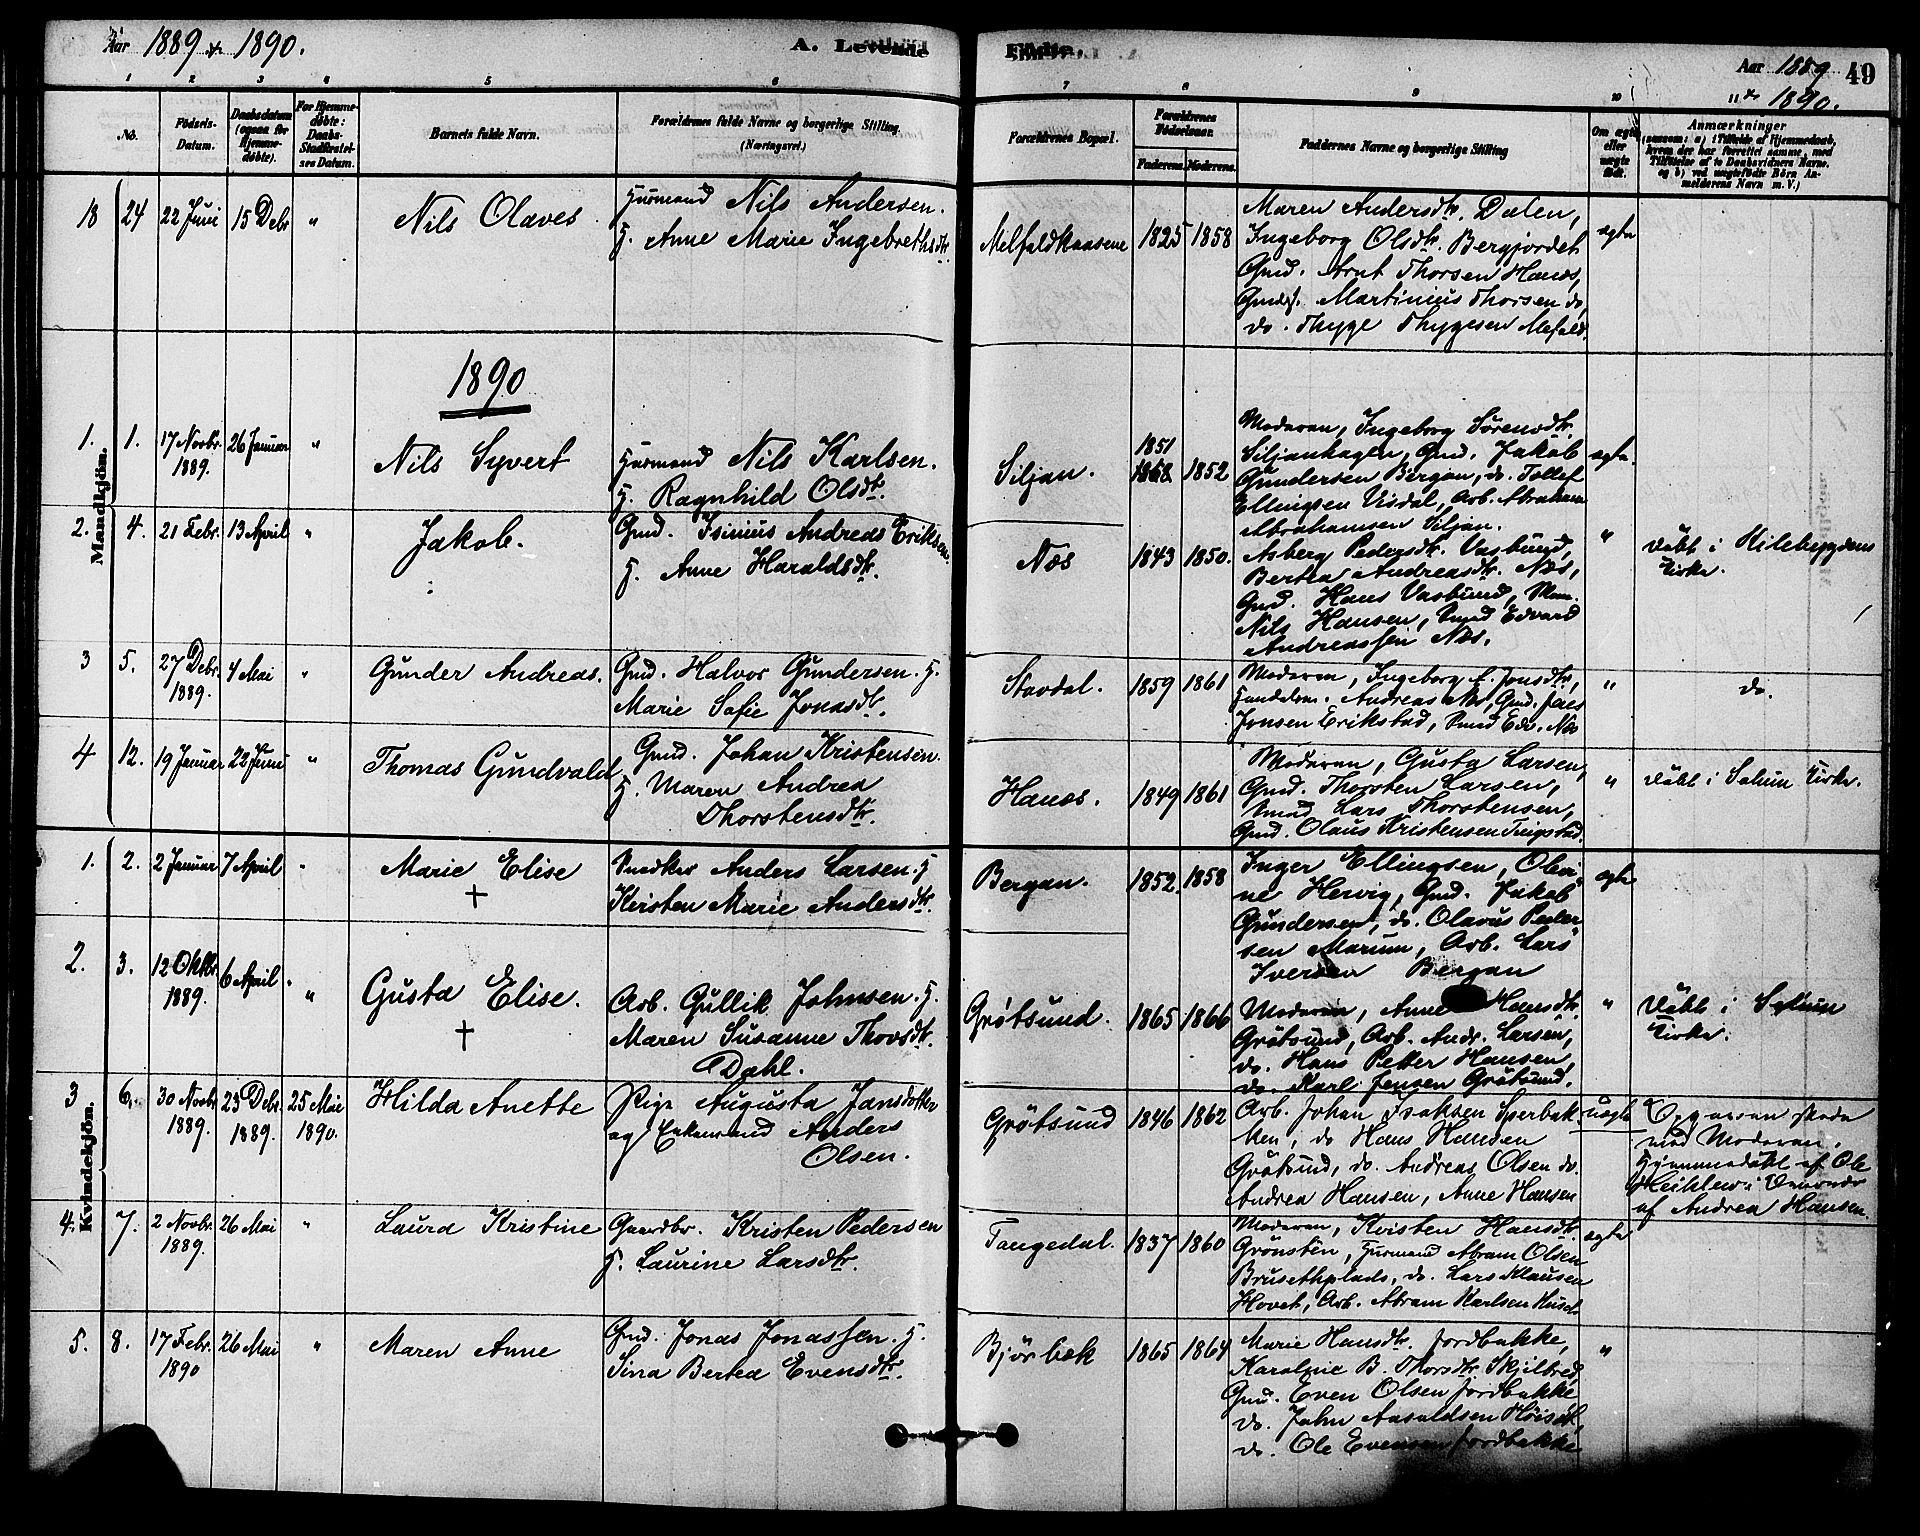 SAKO, Solum kirkebøker, F/Fb/L0001: Ministerialbok nr. II 1, 1877-1892, s. 49